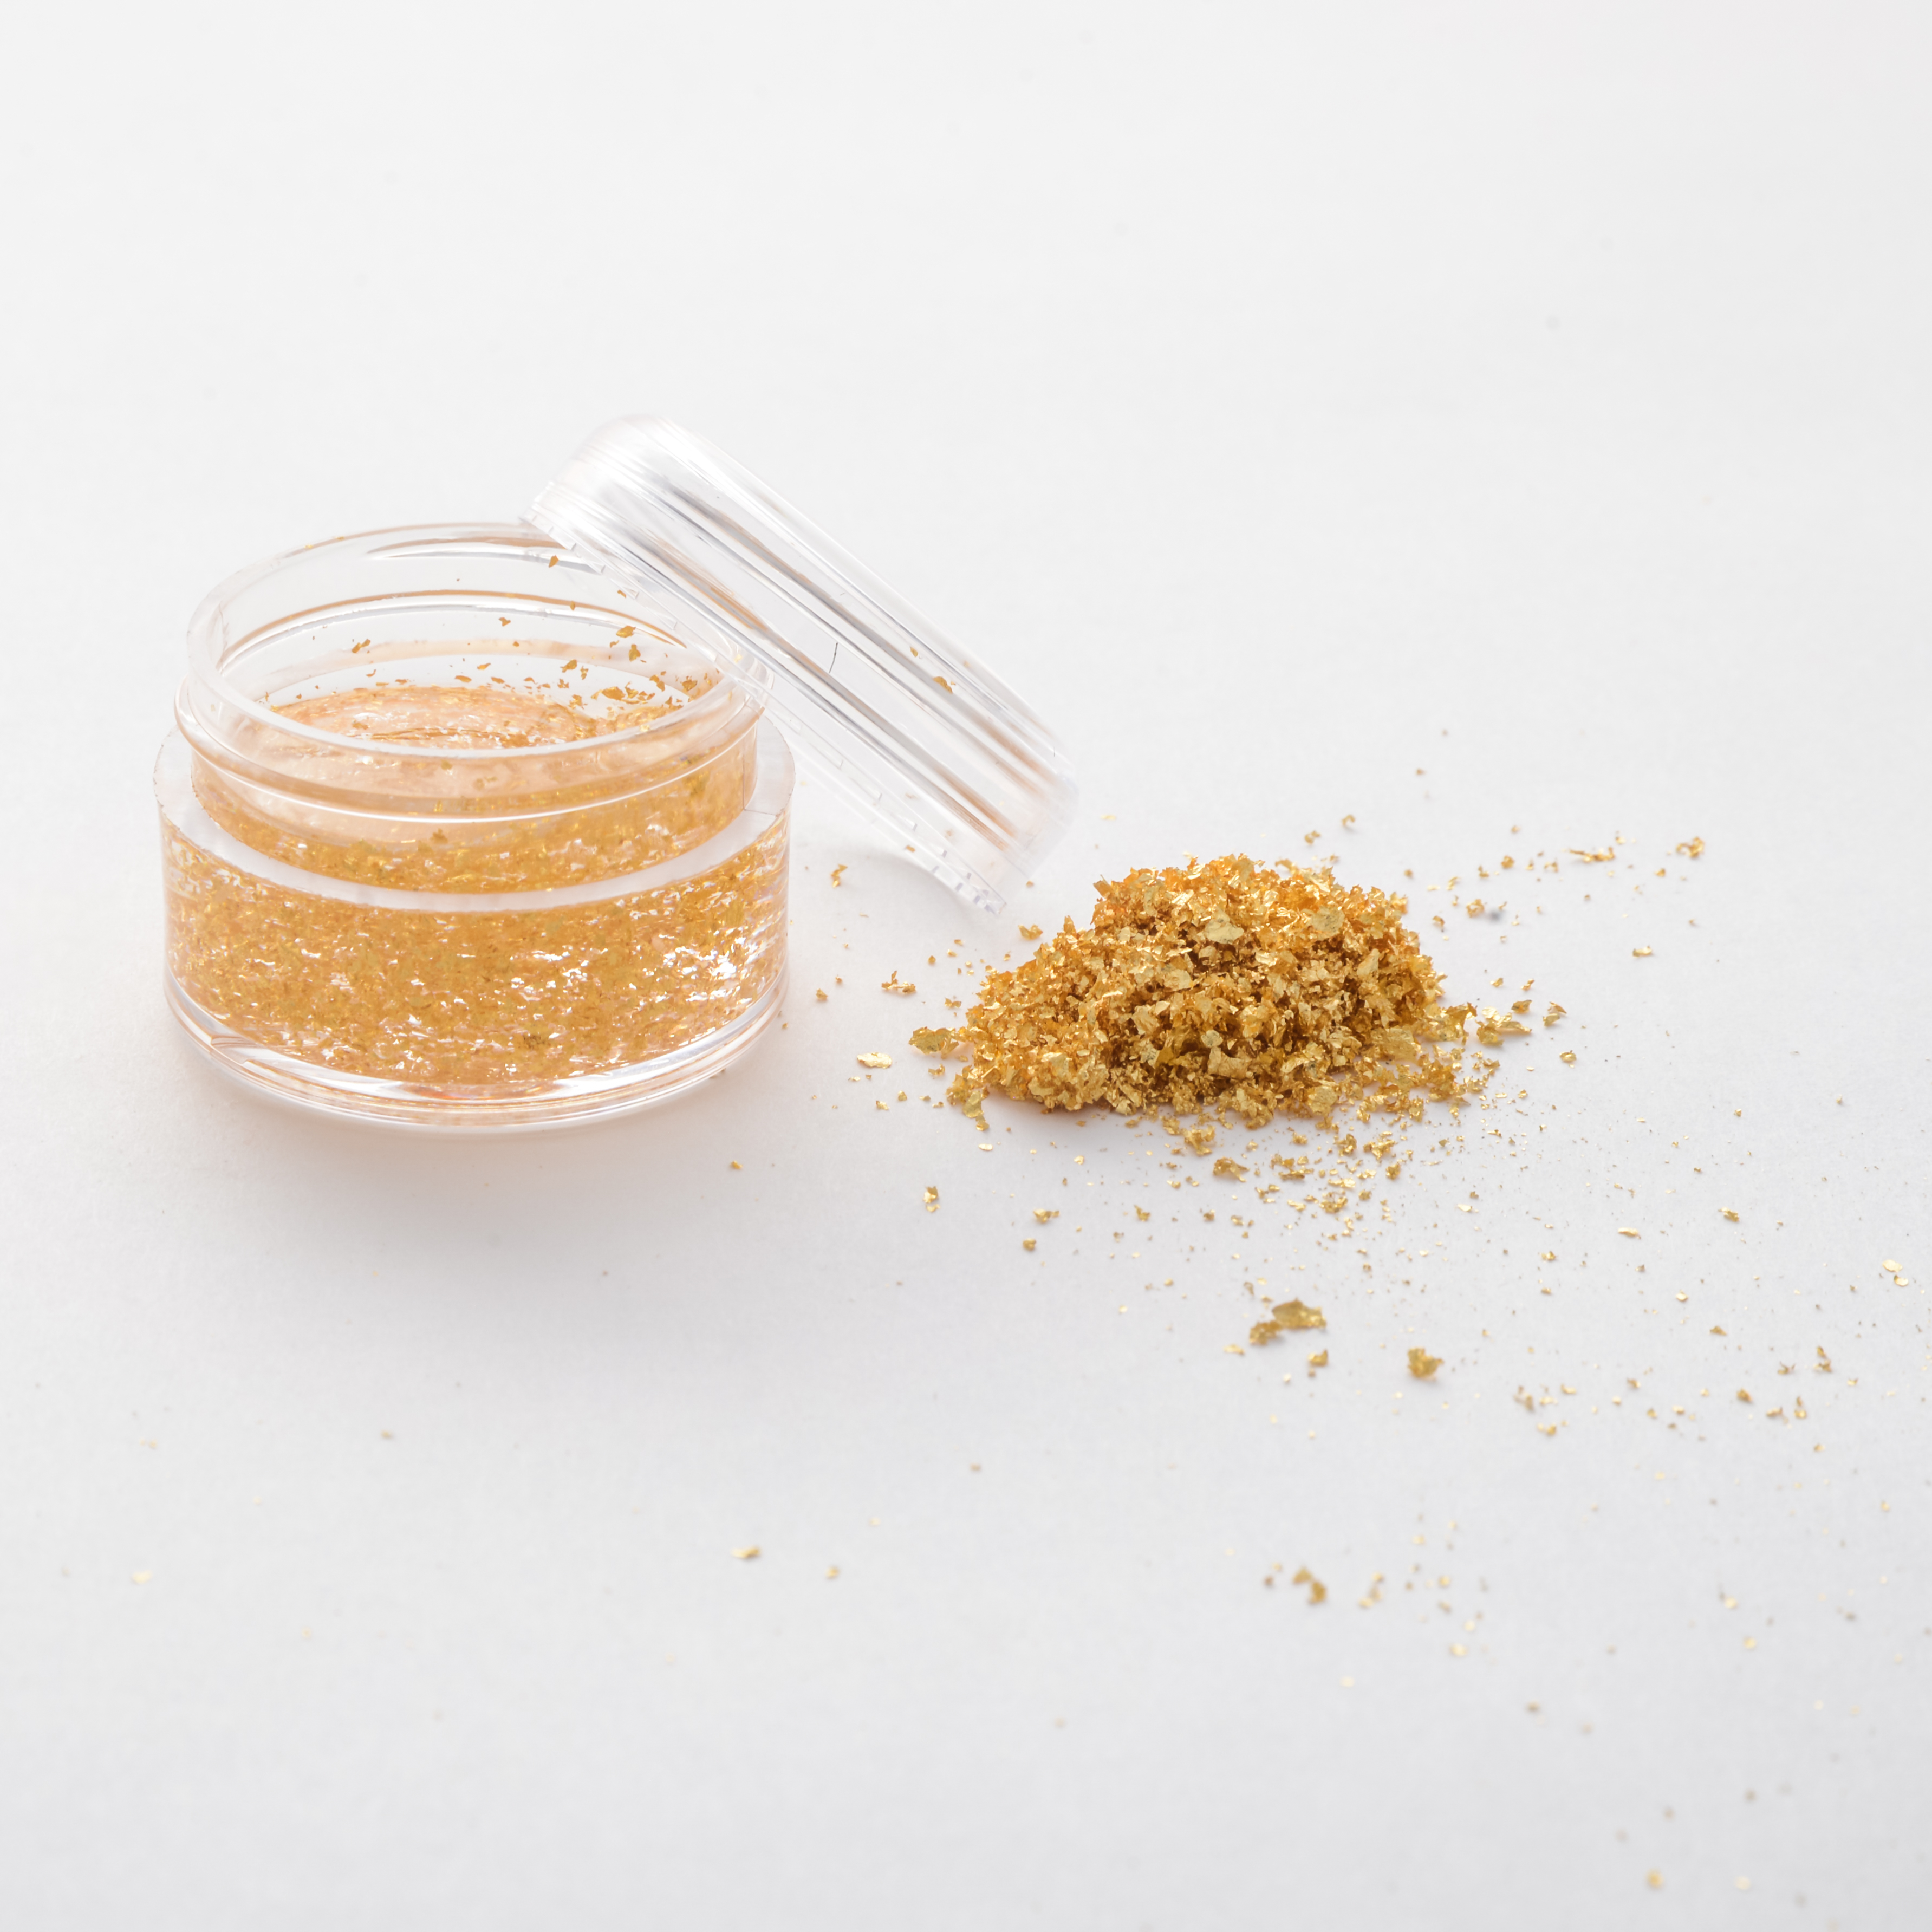 Cosmetic 24 Karat Gold in 2018